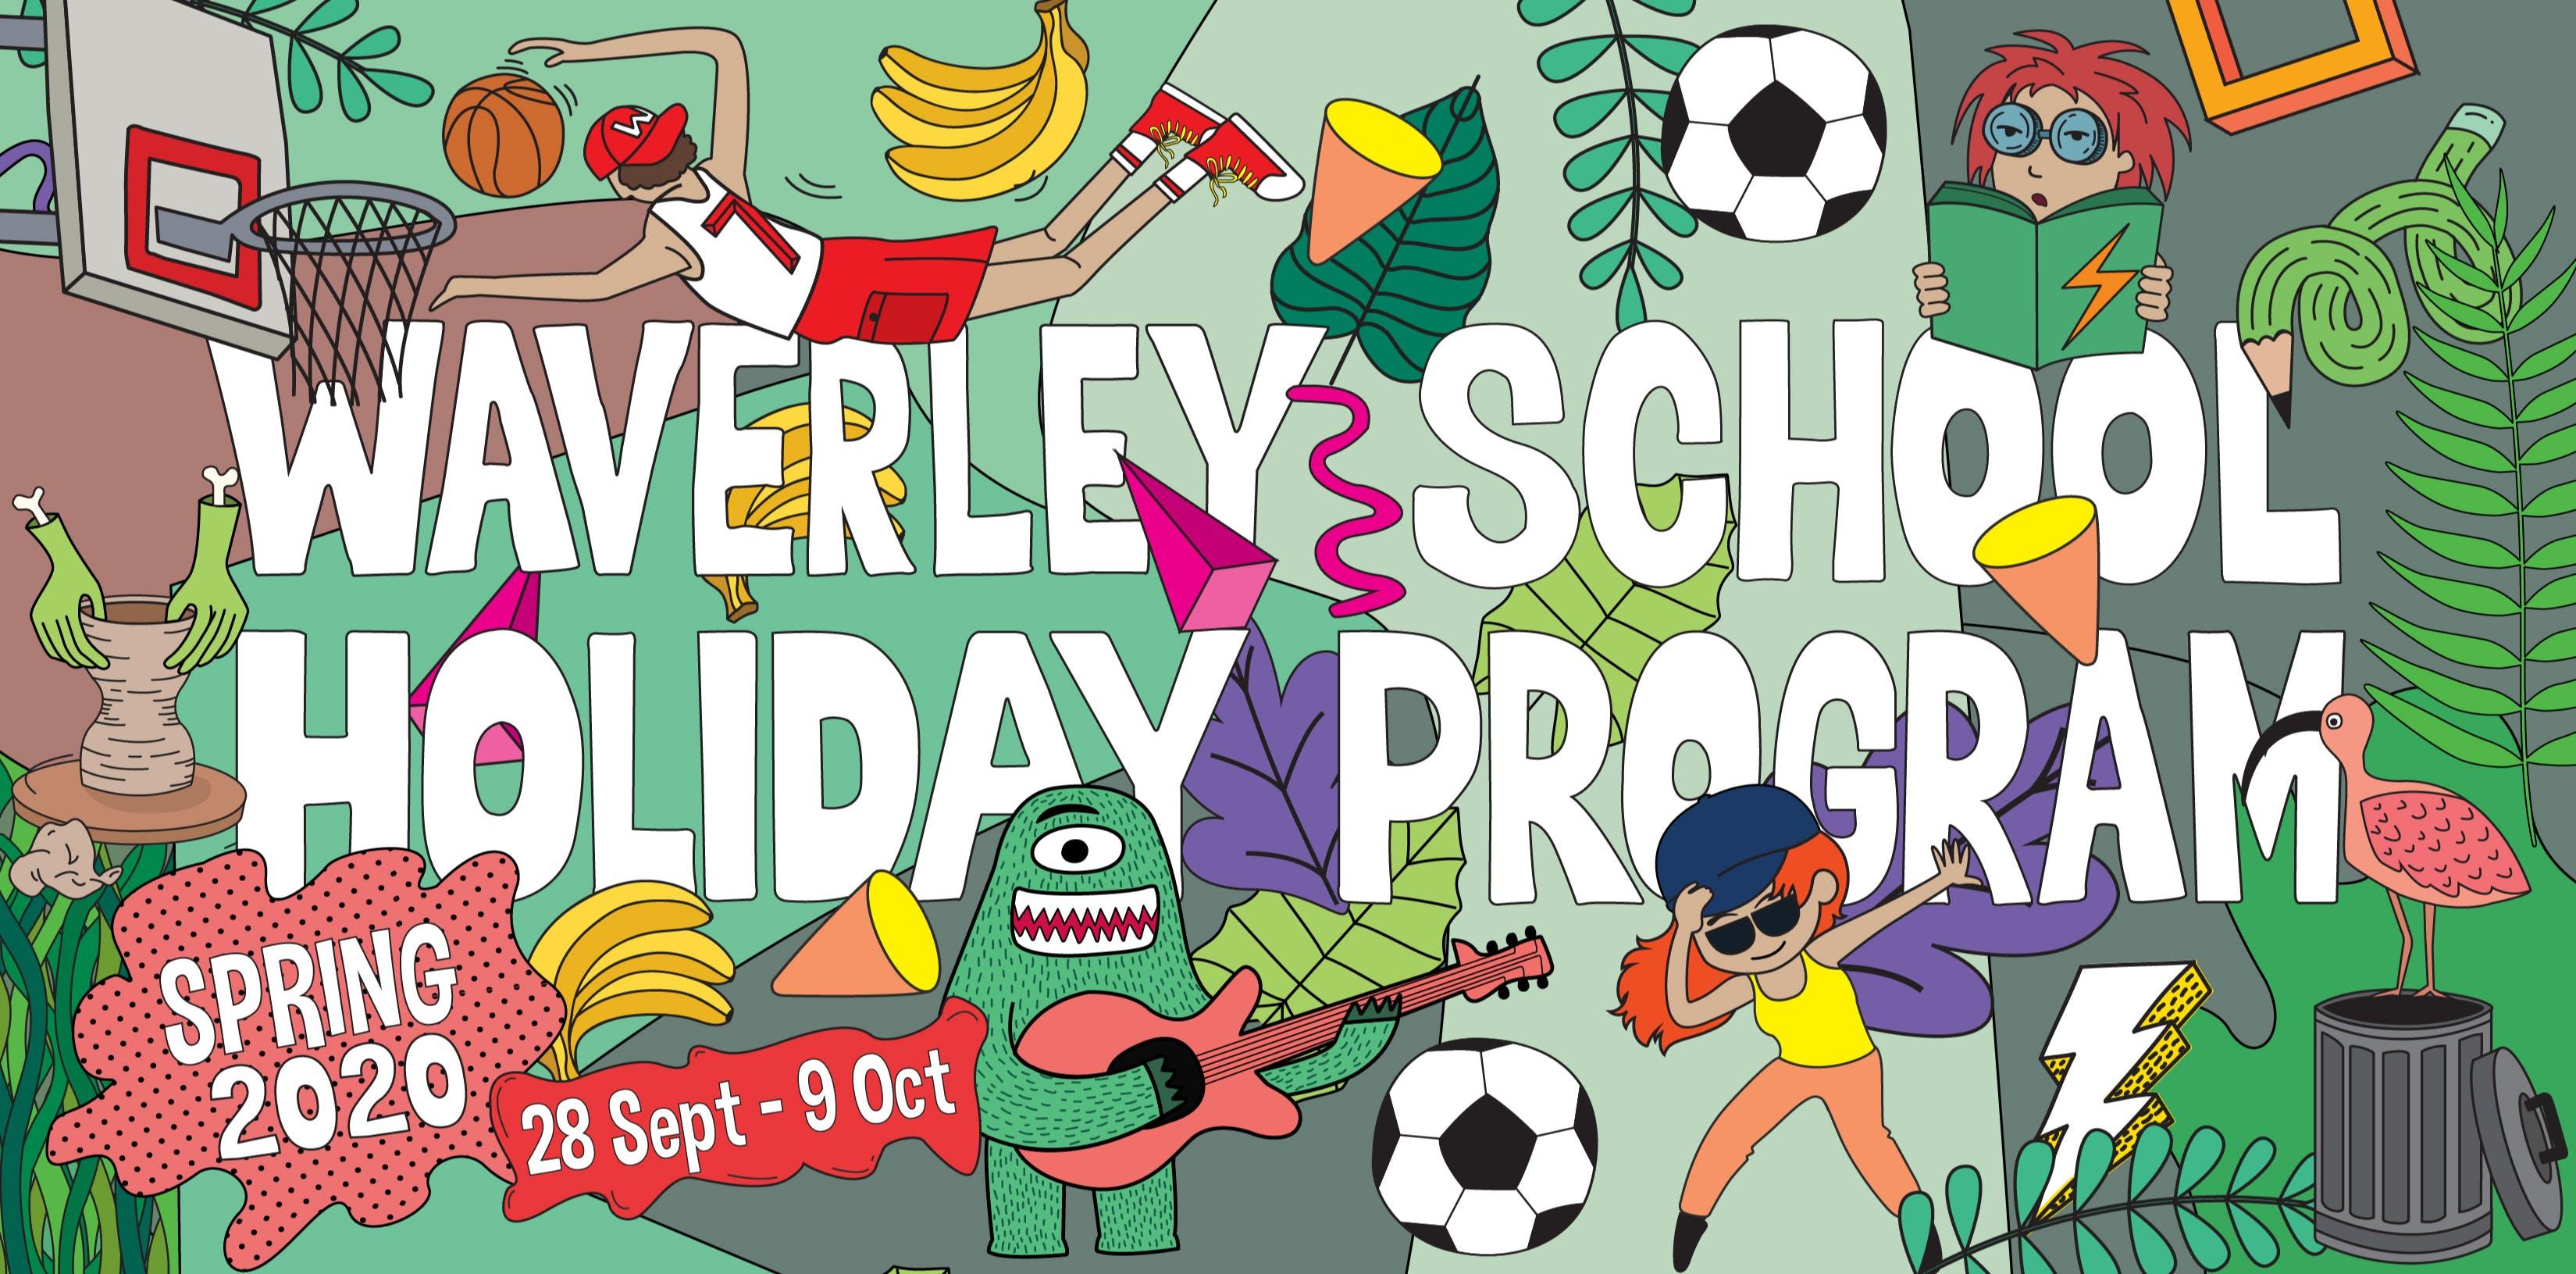 Waverley School Holiday Program Spring 2020